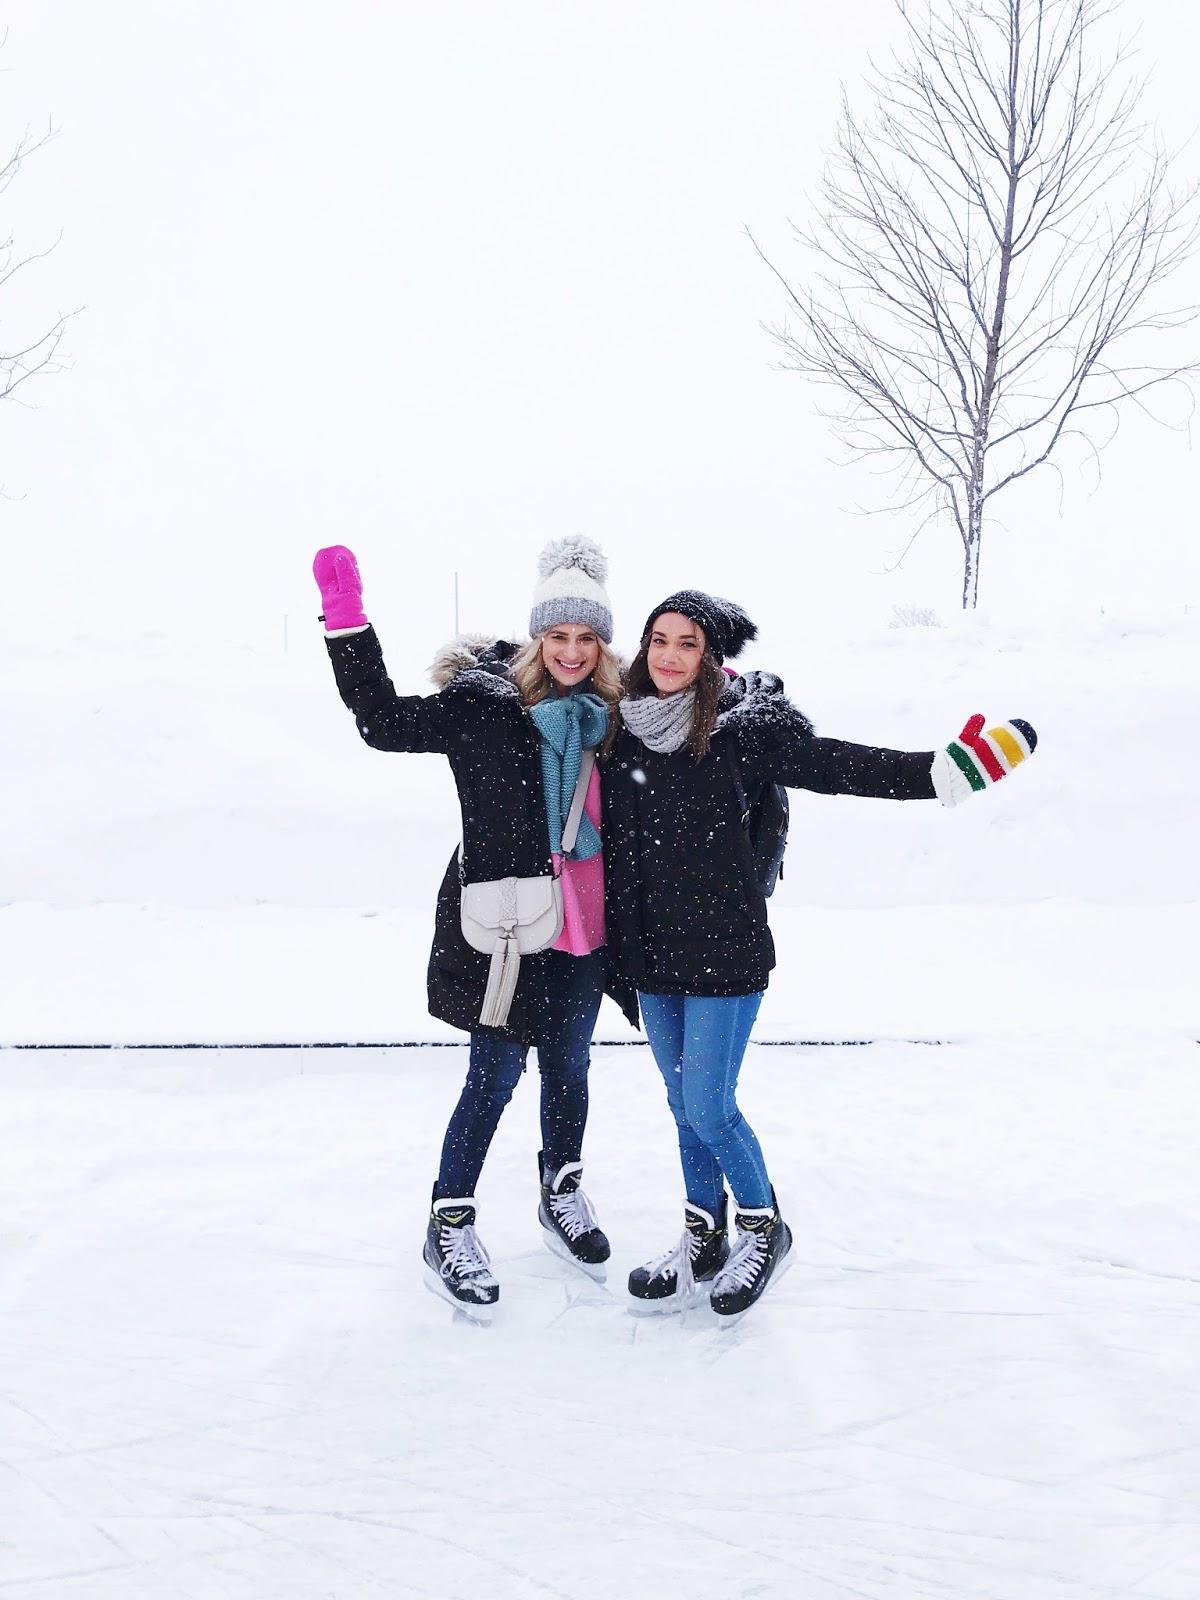 Bijuleni | How To Unwind at White Oaks Resort & Spa, Niagara on the Lake | Girls Weekend Getaway| Skating in style